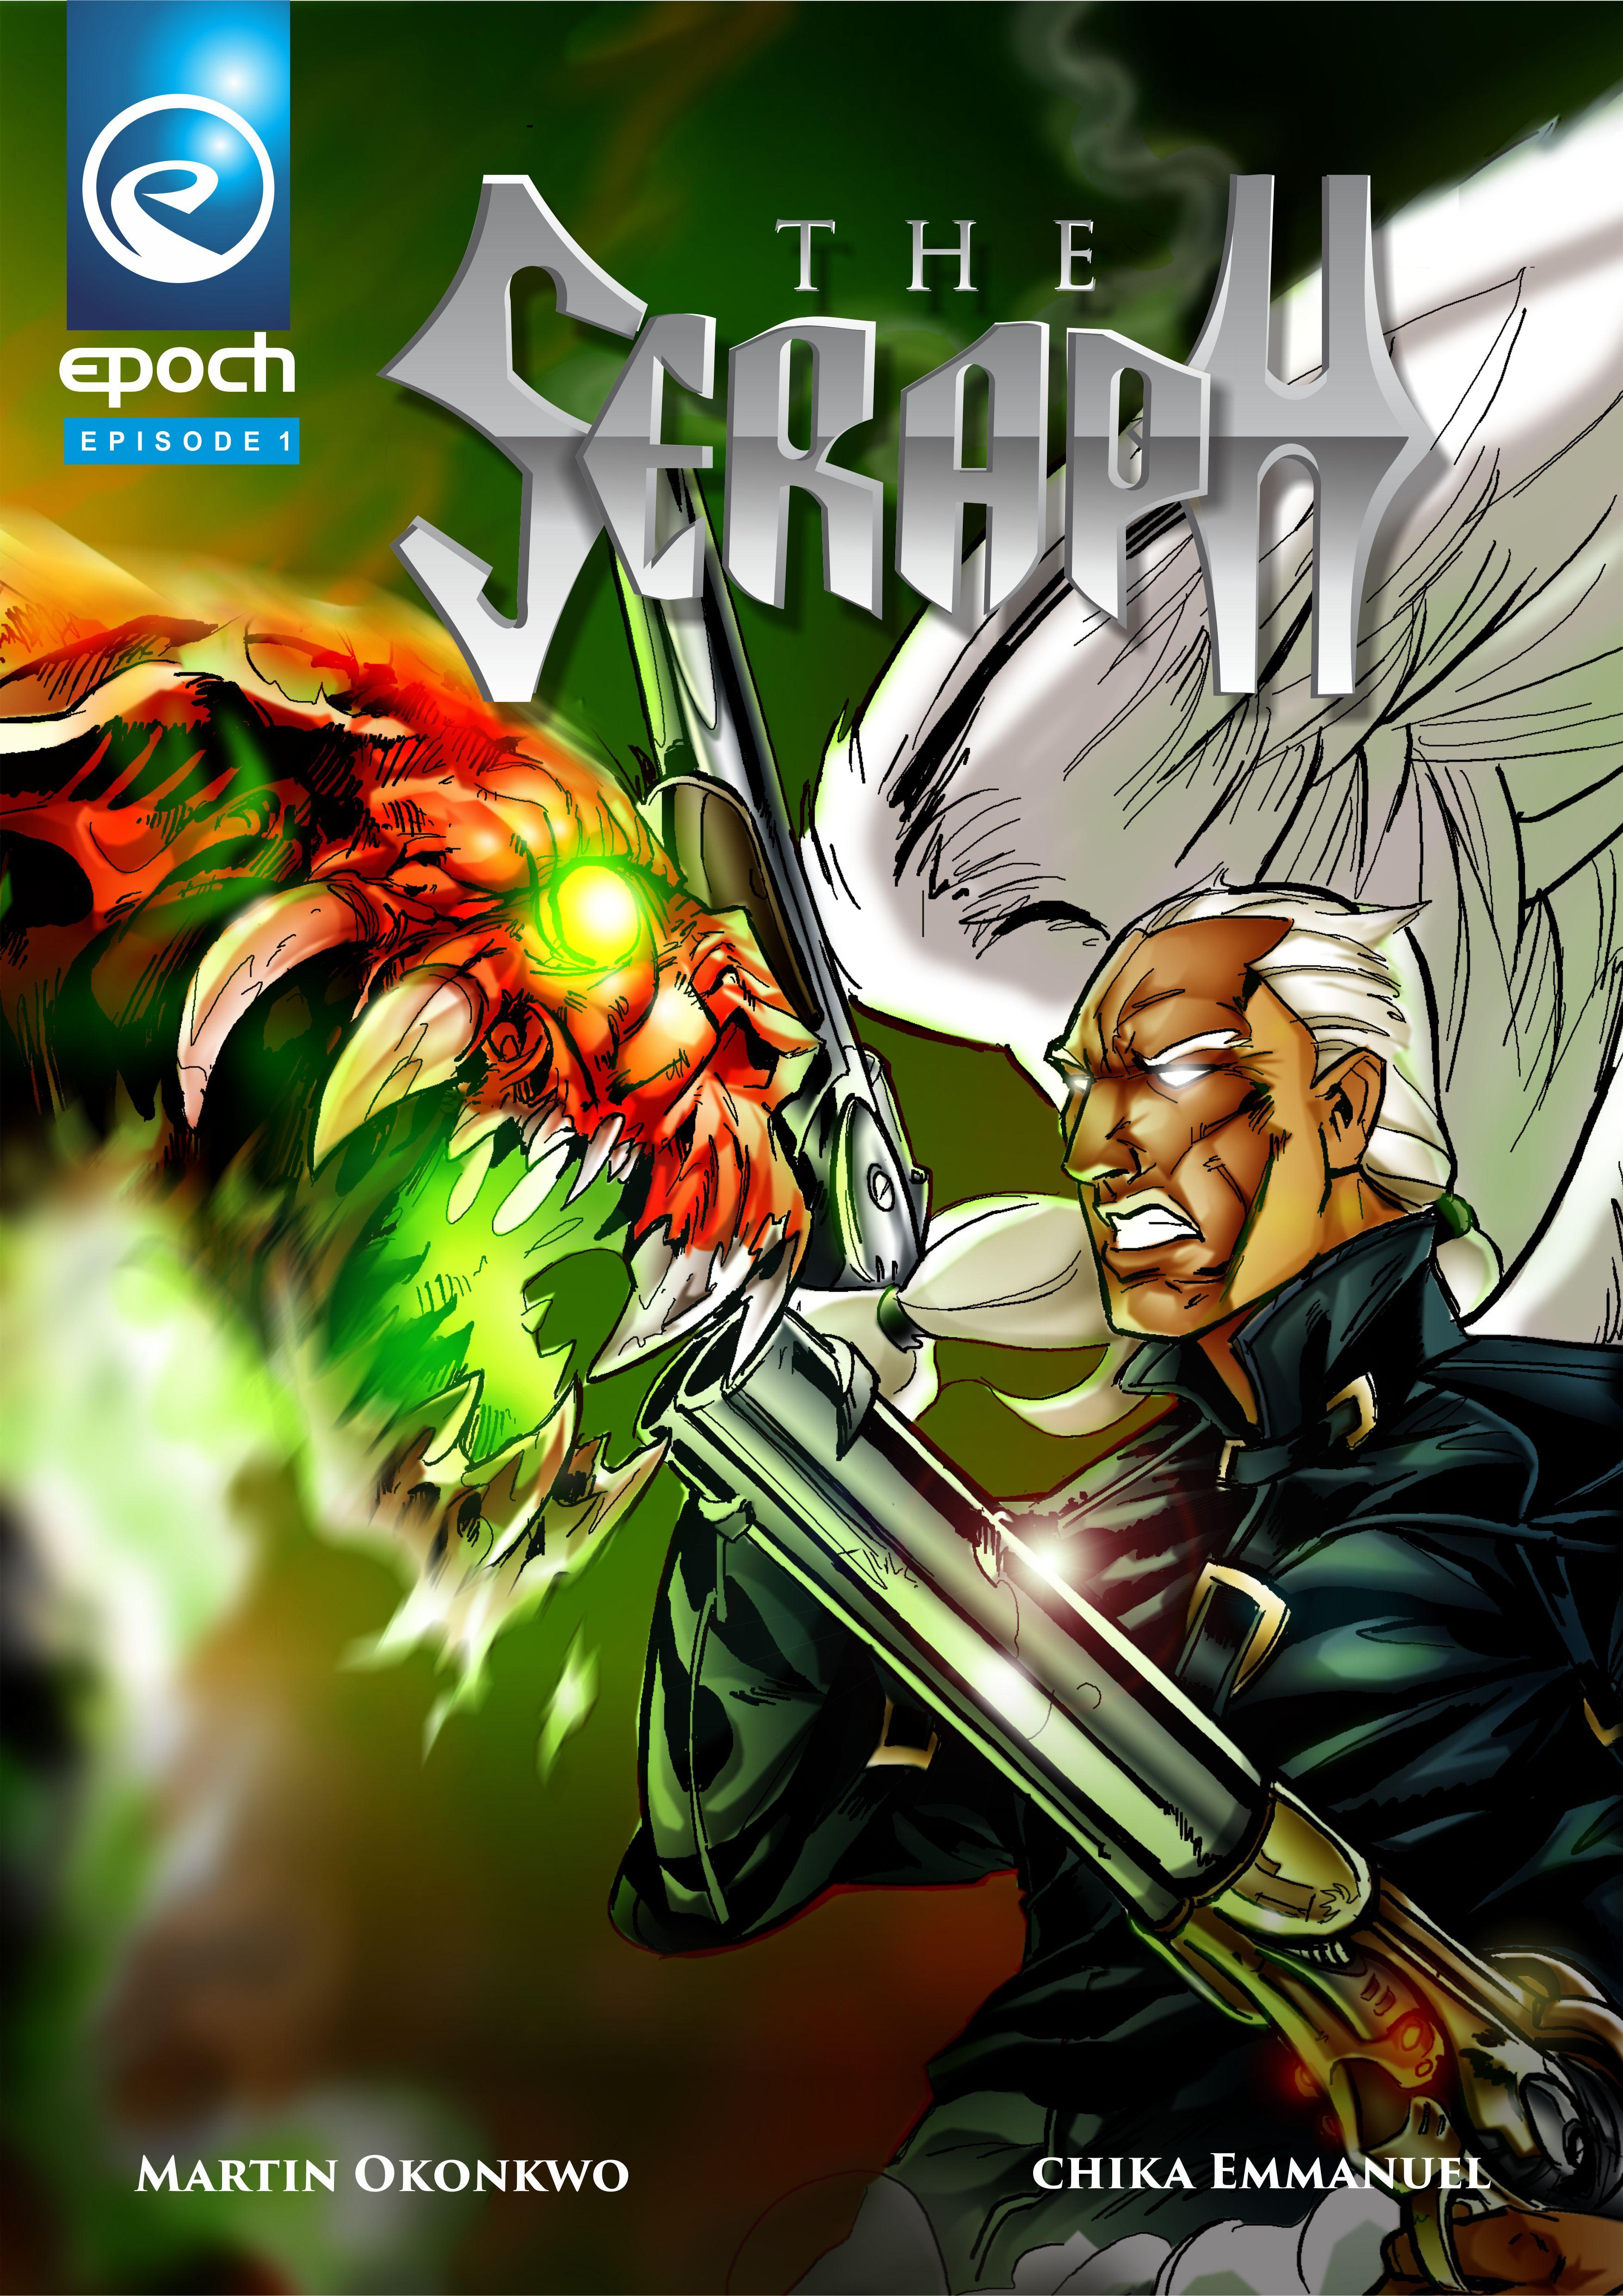 Seraph 1